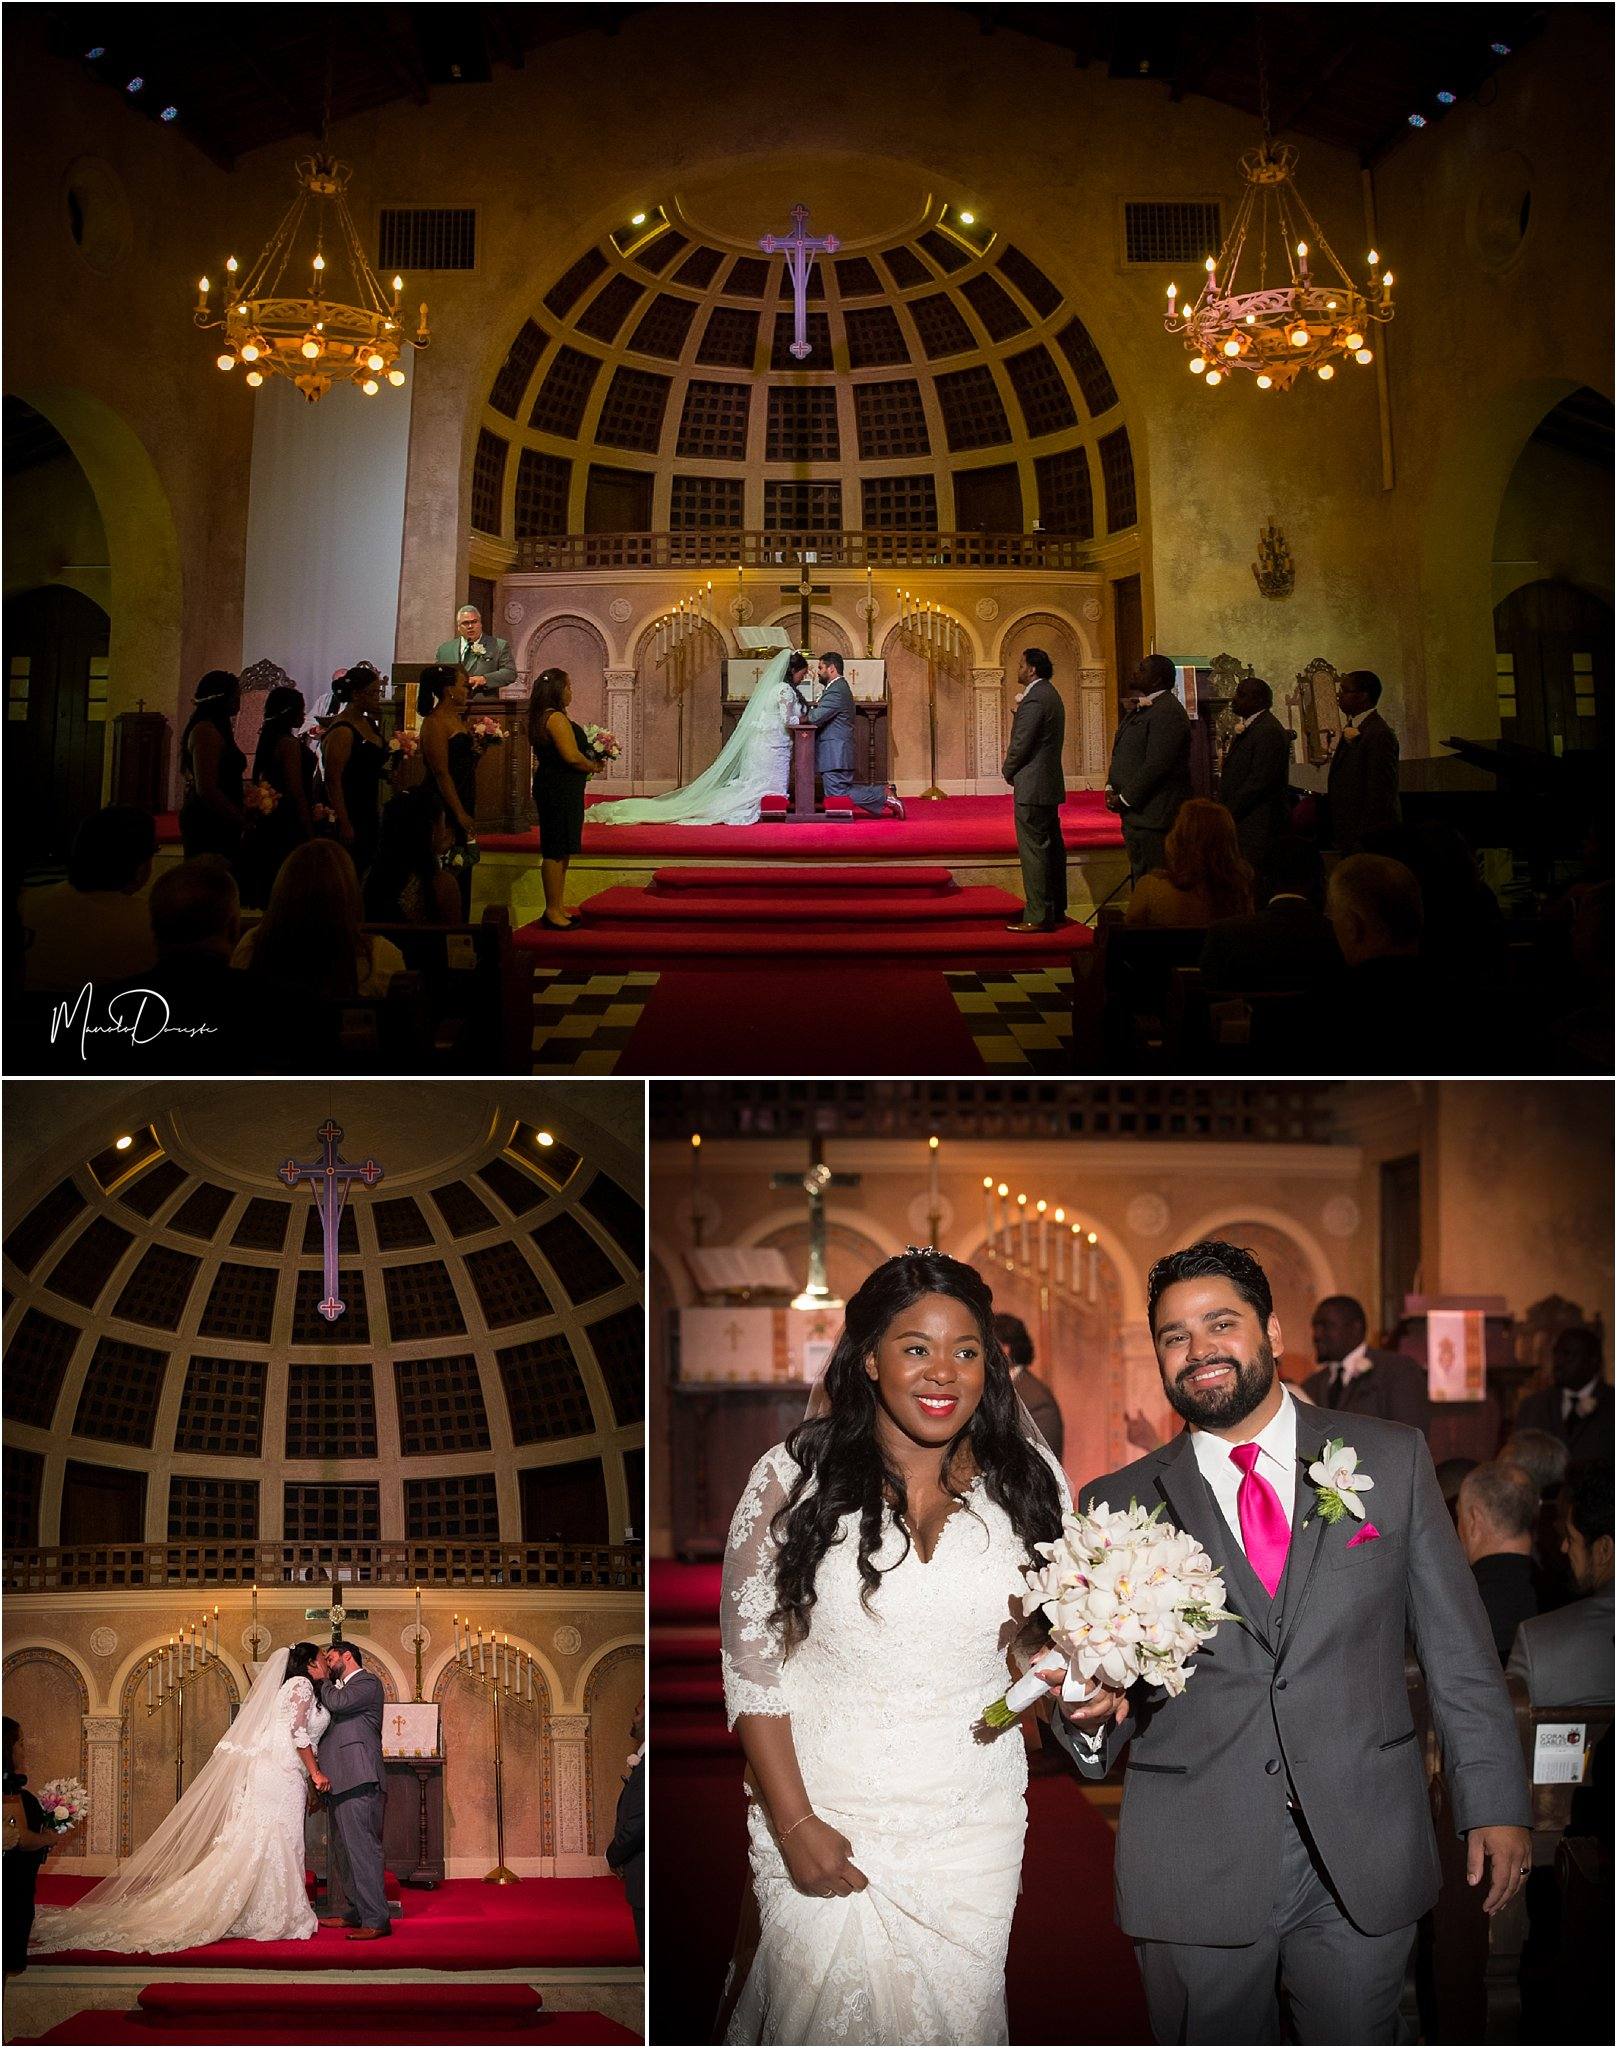 0424_ManoloDoreste_InFocusStudios_Wedding_Family_Photography_Miami_MiamiPhotographer.jpg